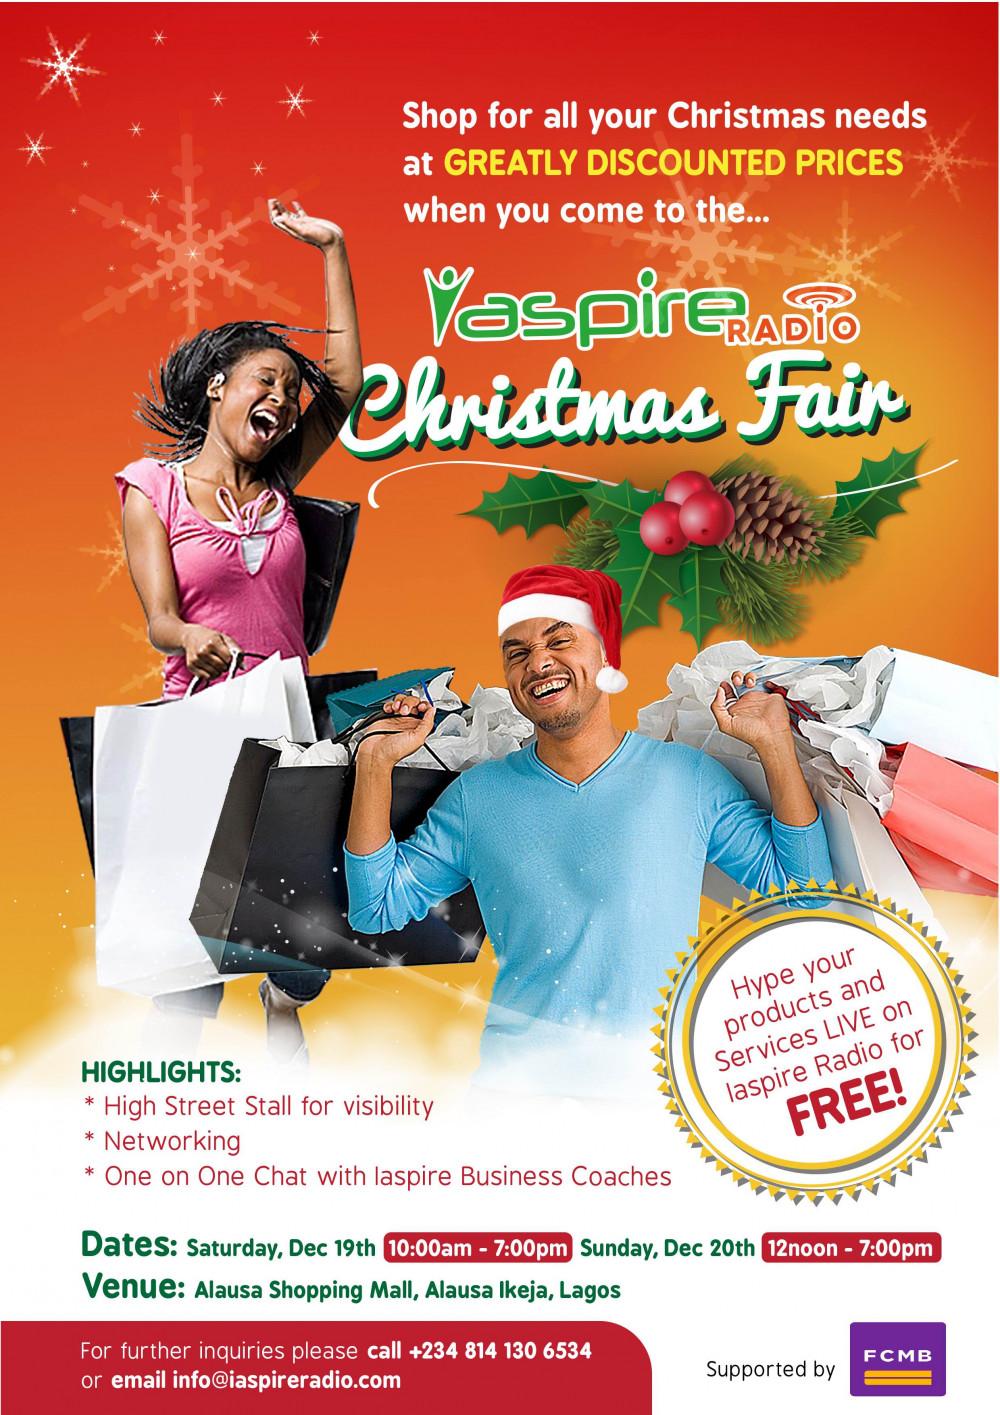 iaspire Xmas Fair 2015